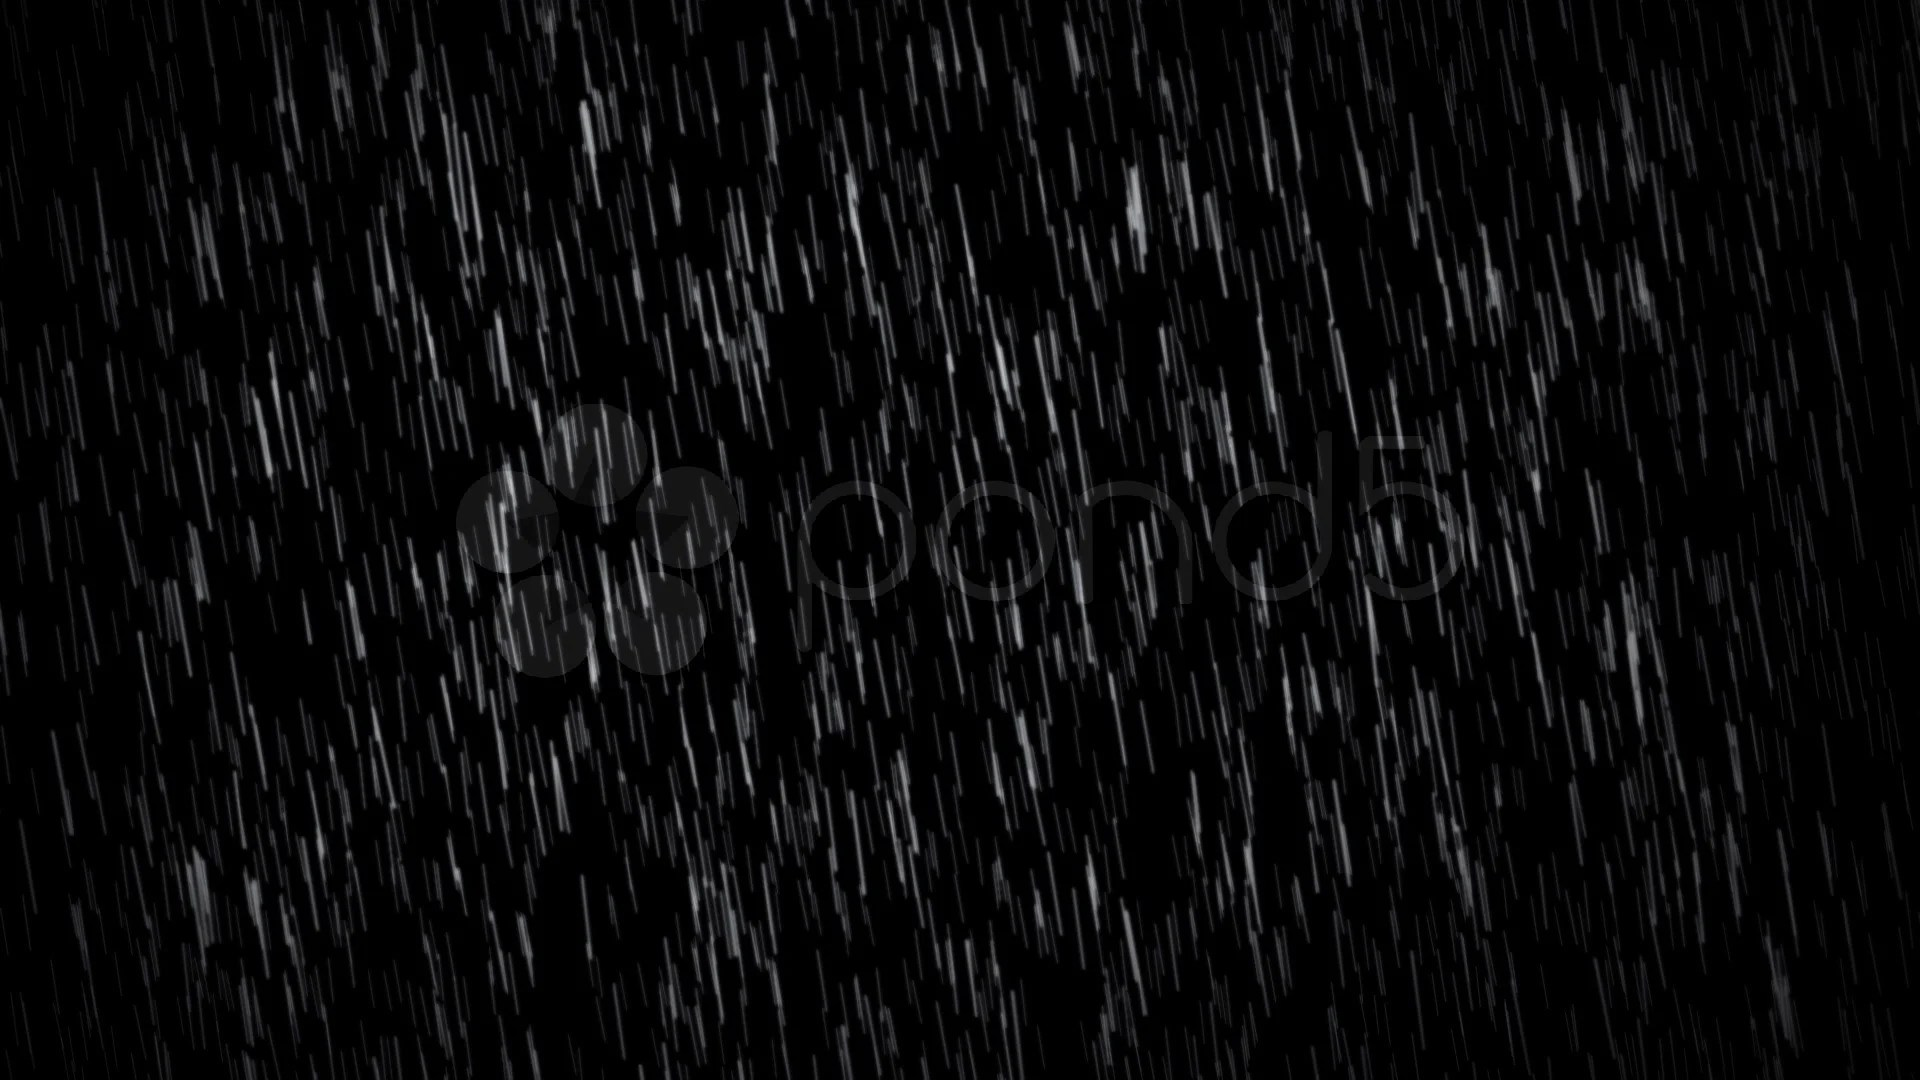 Free 3d Snow Falling Wallpaper Rain Overlay Sd Hd Amp 4k Stock Footage 000740933 Pond5